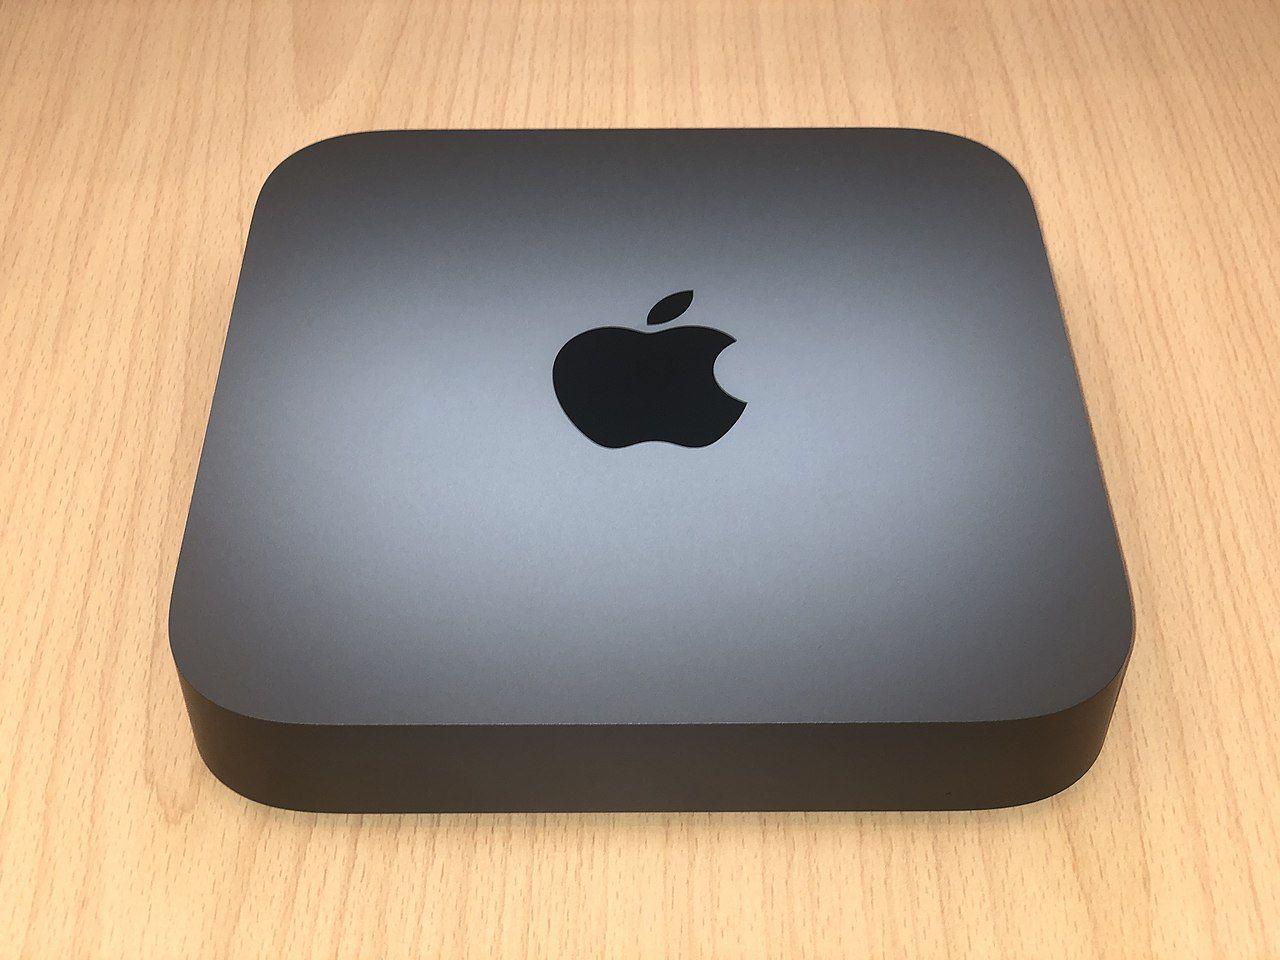 Mac Mini får dubbelt så mycket lagringsminne